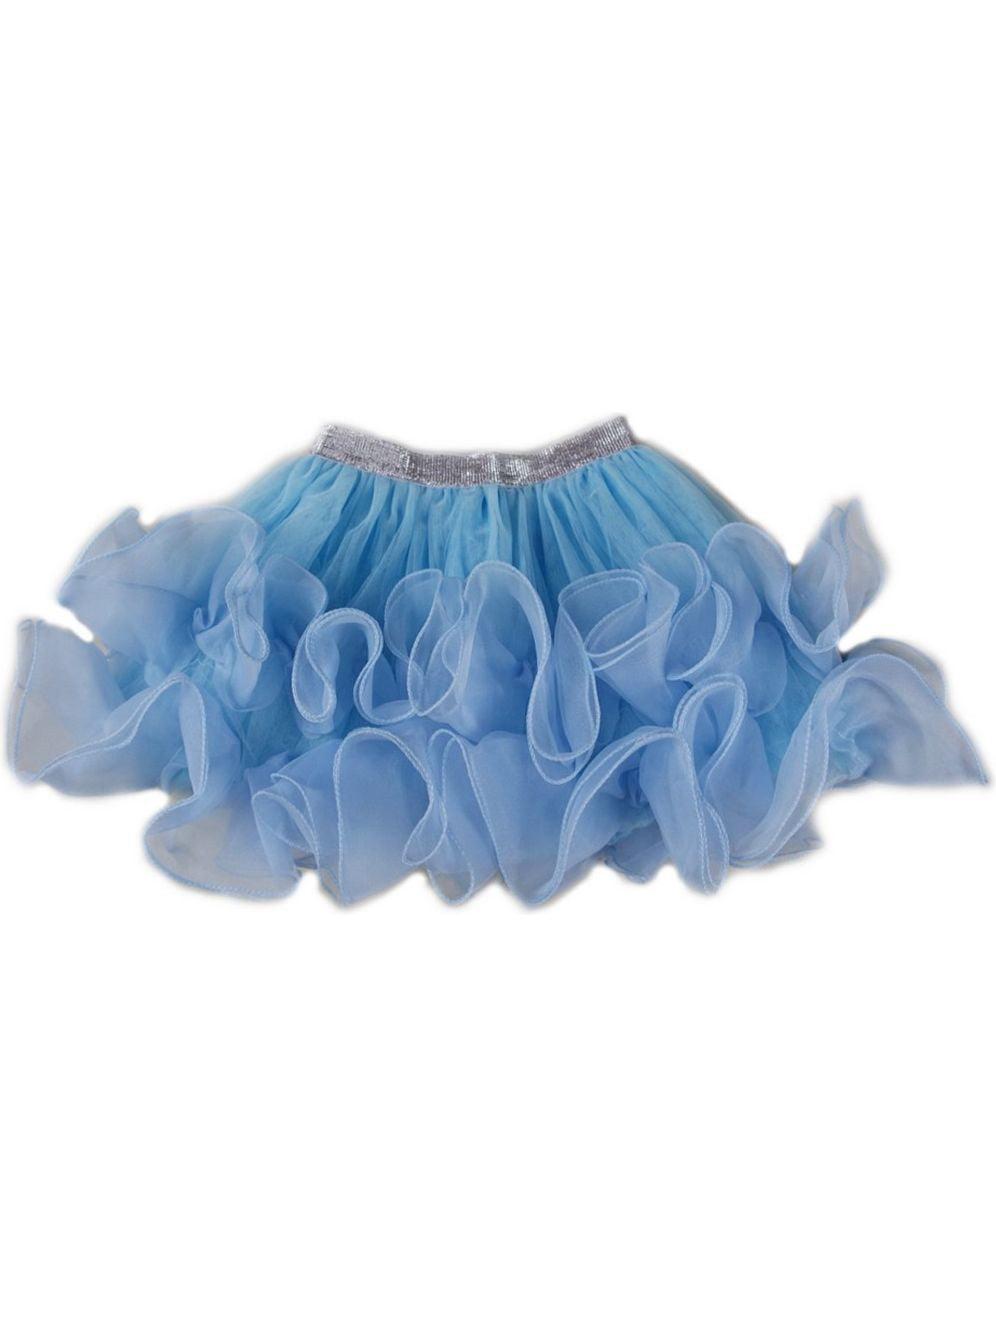 Wenchoice Girls Blue Wave Trimmed Flouncy Tutu Skirt